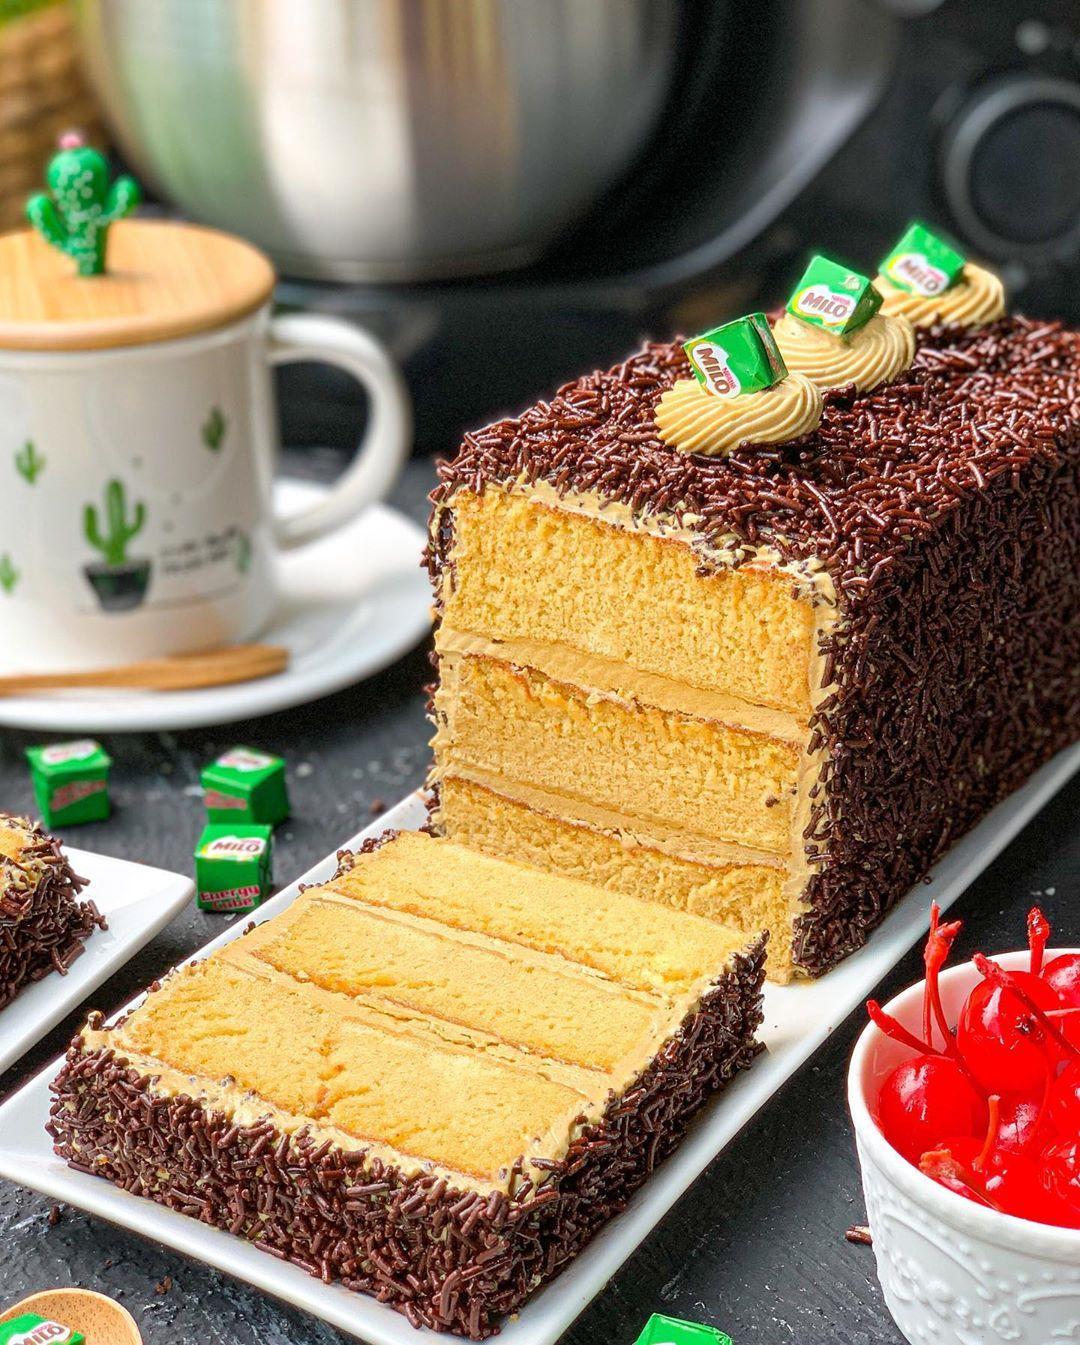 Vitakwee Kitchen On Instagram Alooo Makk Baking Nya Masih Seputar Oles Mengoles Buttercream Jadul Sisaan Kemaren Bikin Cream Masih Sta Resep Kue Kue Resep